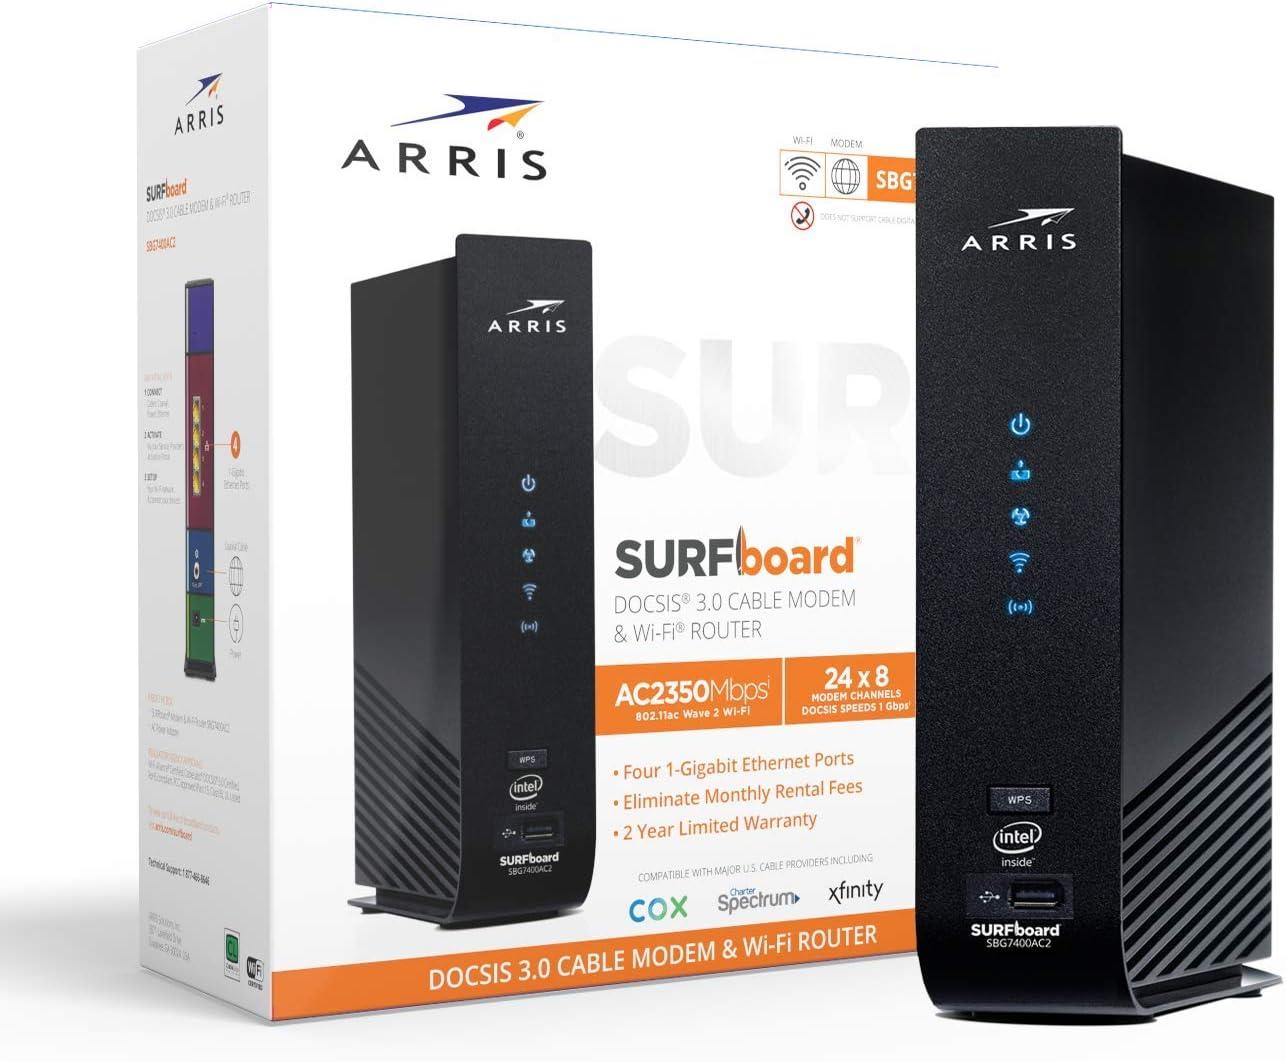 ARRIS Surfboard SB8200 Modem